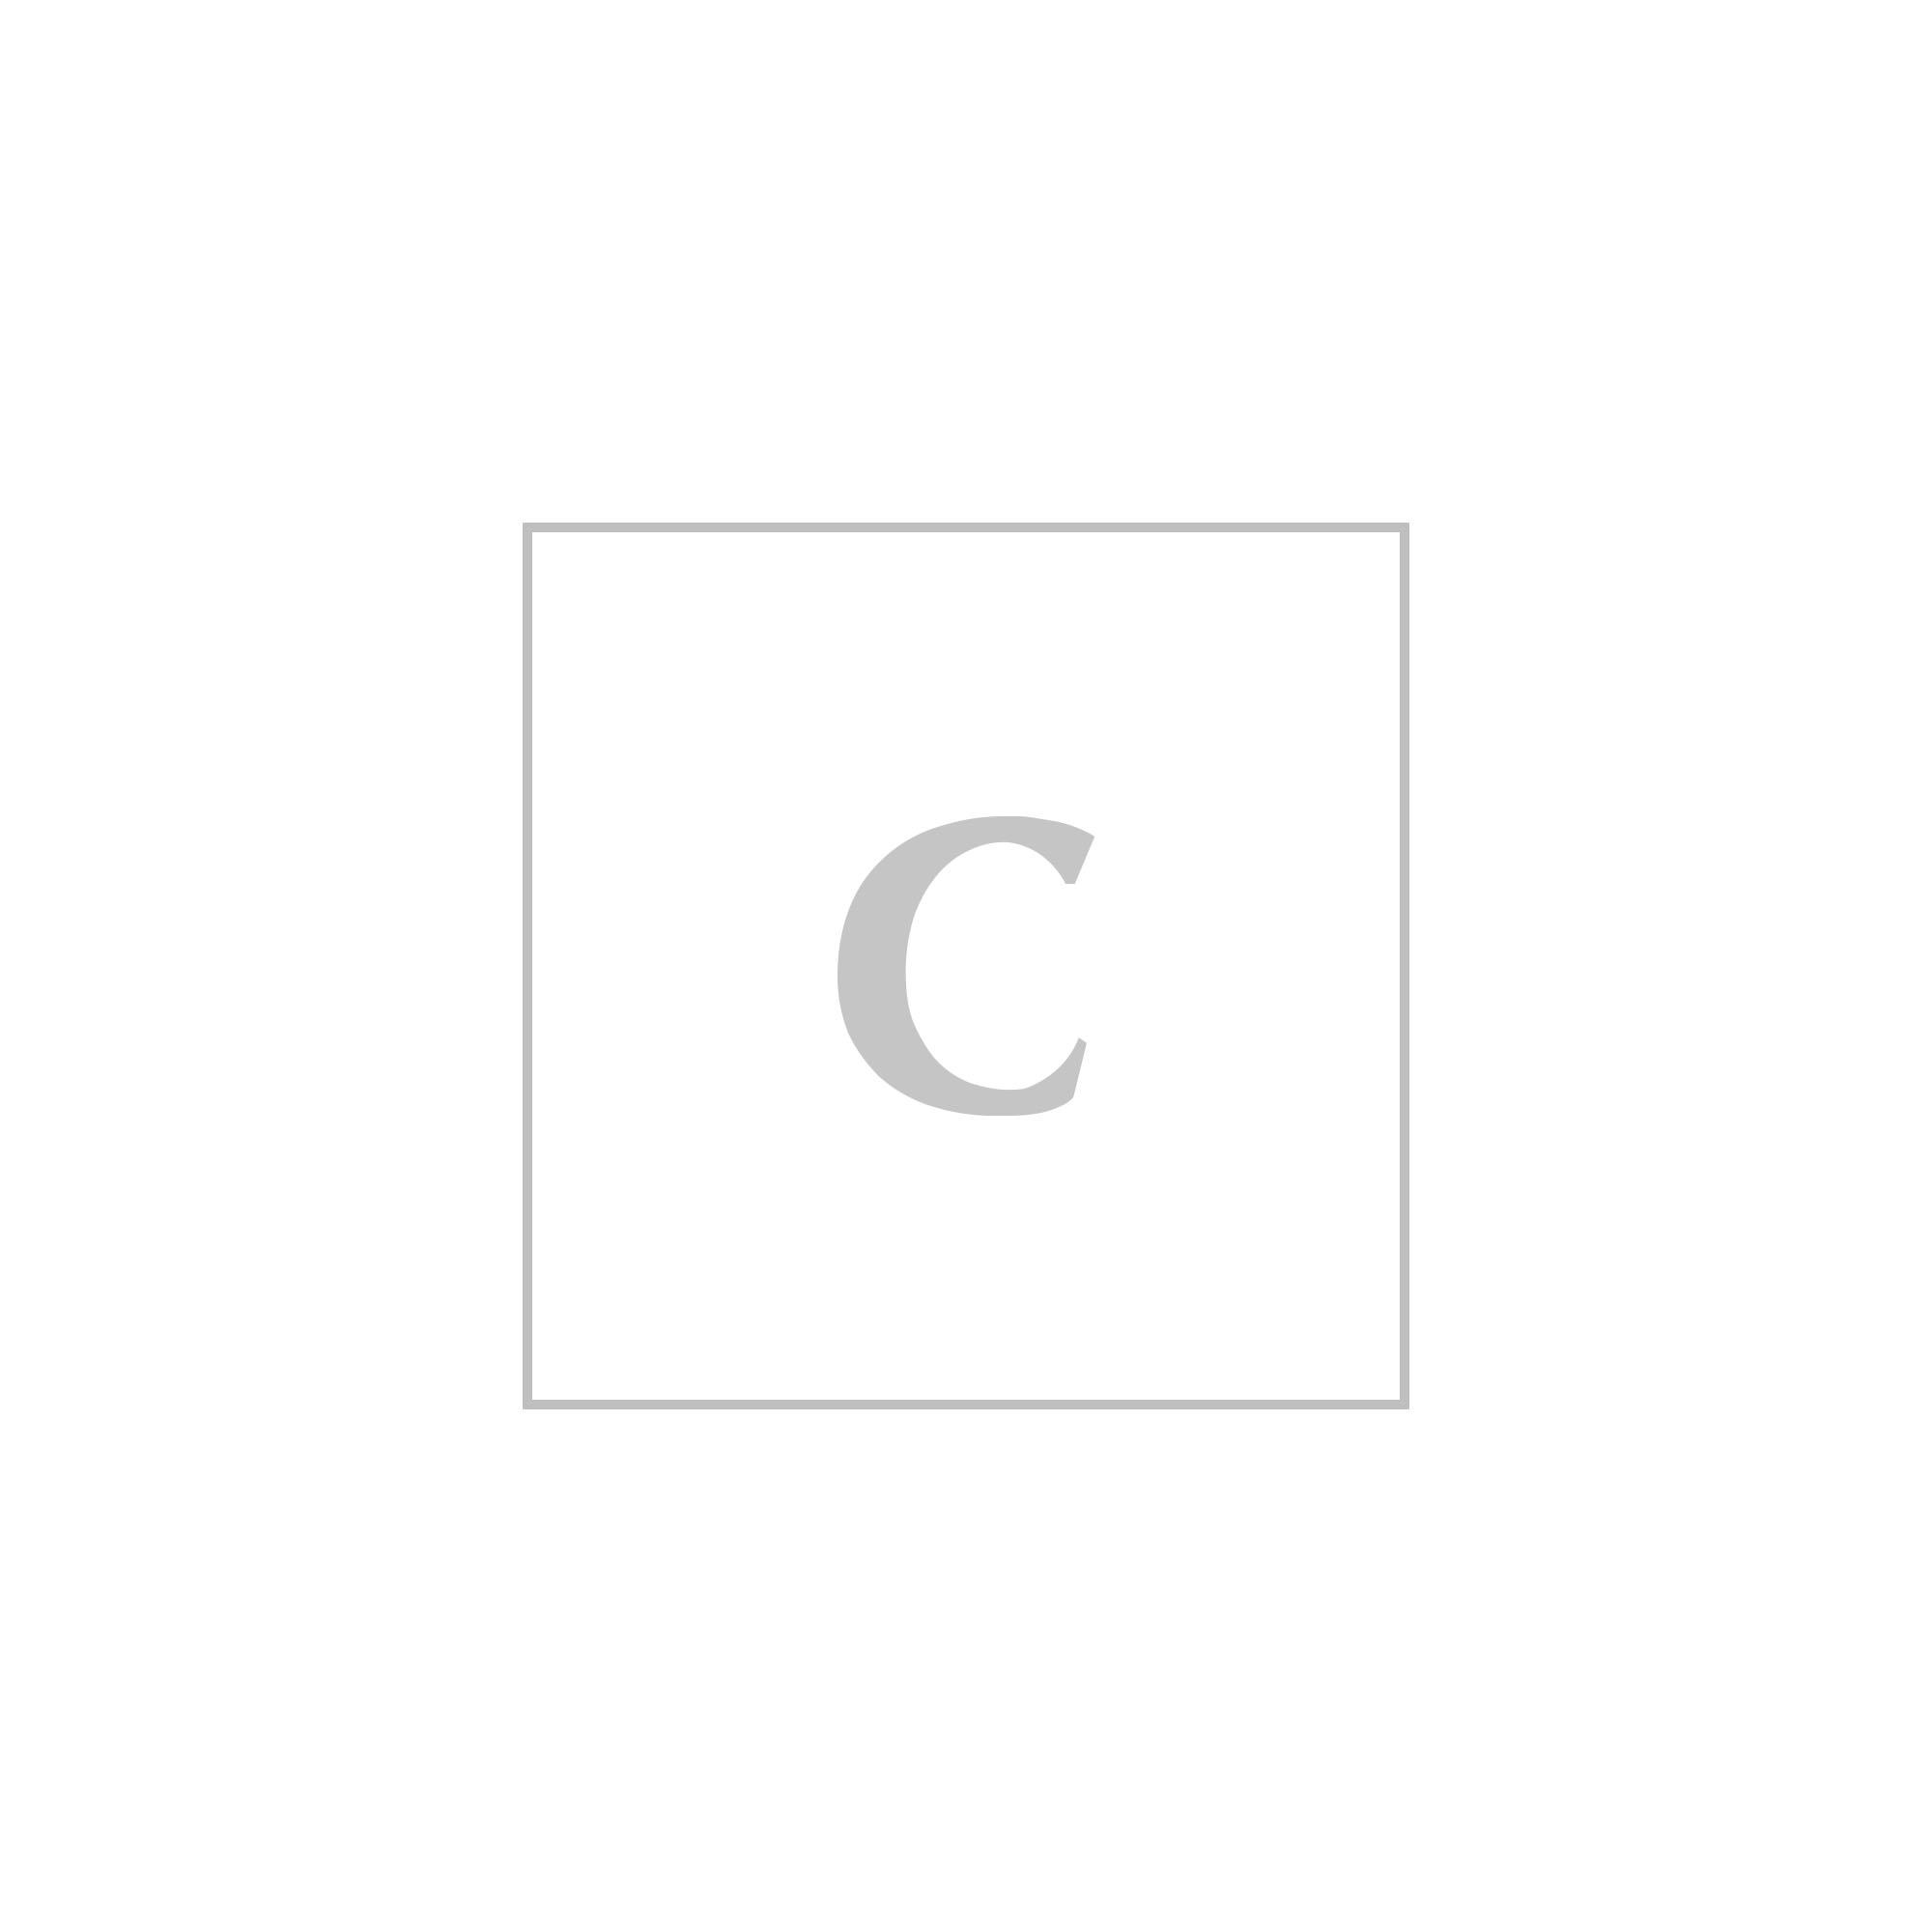 Saint laurent ysl grained calfskin monogram wallet